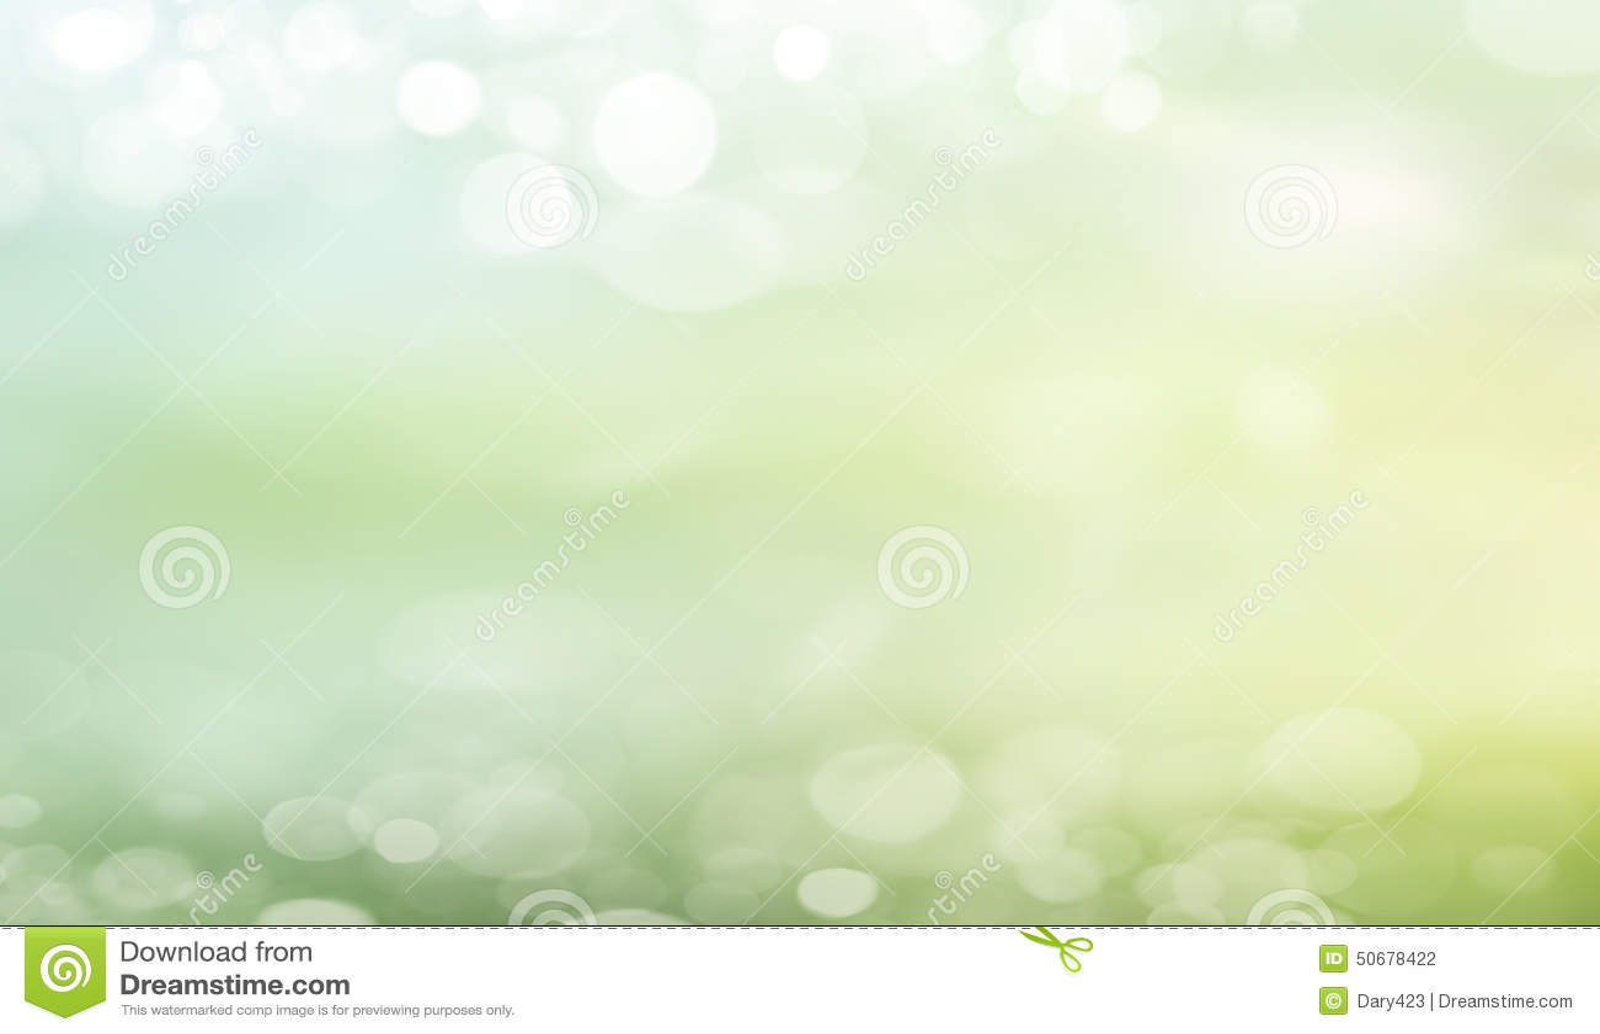 Download 抽象背景春天 库存照片. 图片 包括有 beautifuler, 颜色, 桌面, 概念, 绿色, 背包, 叶子 - 50678422